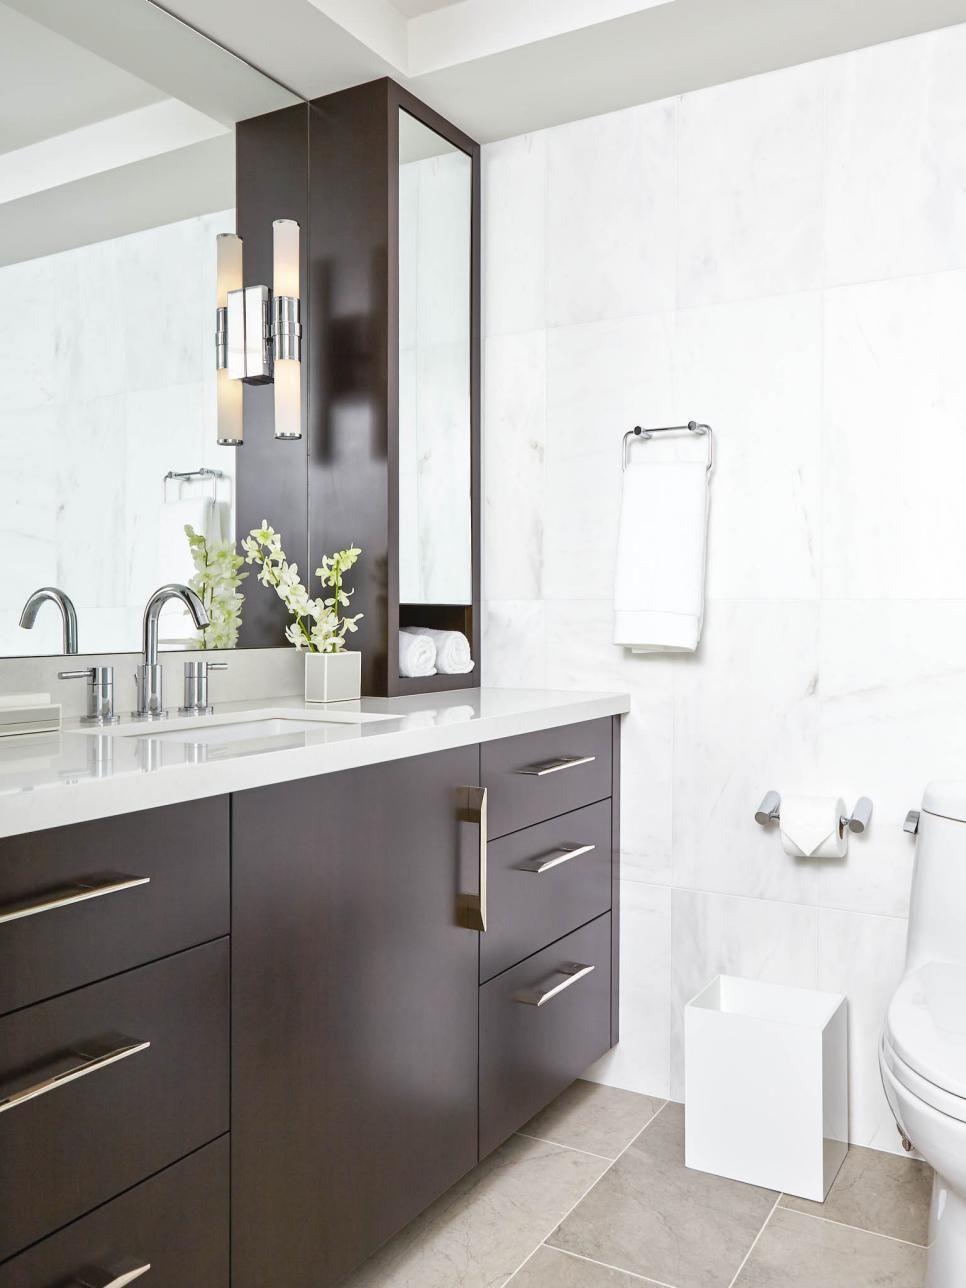 The Year S Best Bathrooms Nkba Bath Design Finalists For 2014 Modern White Bathroom Bathroom Design Small Contemporary Bathrooms Hgtv bathrooms design ideas